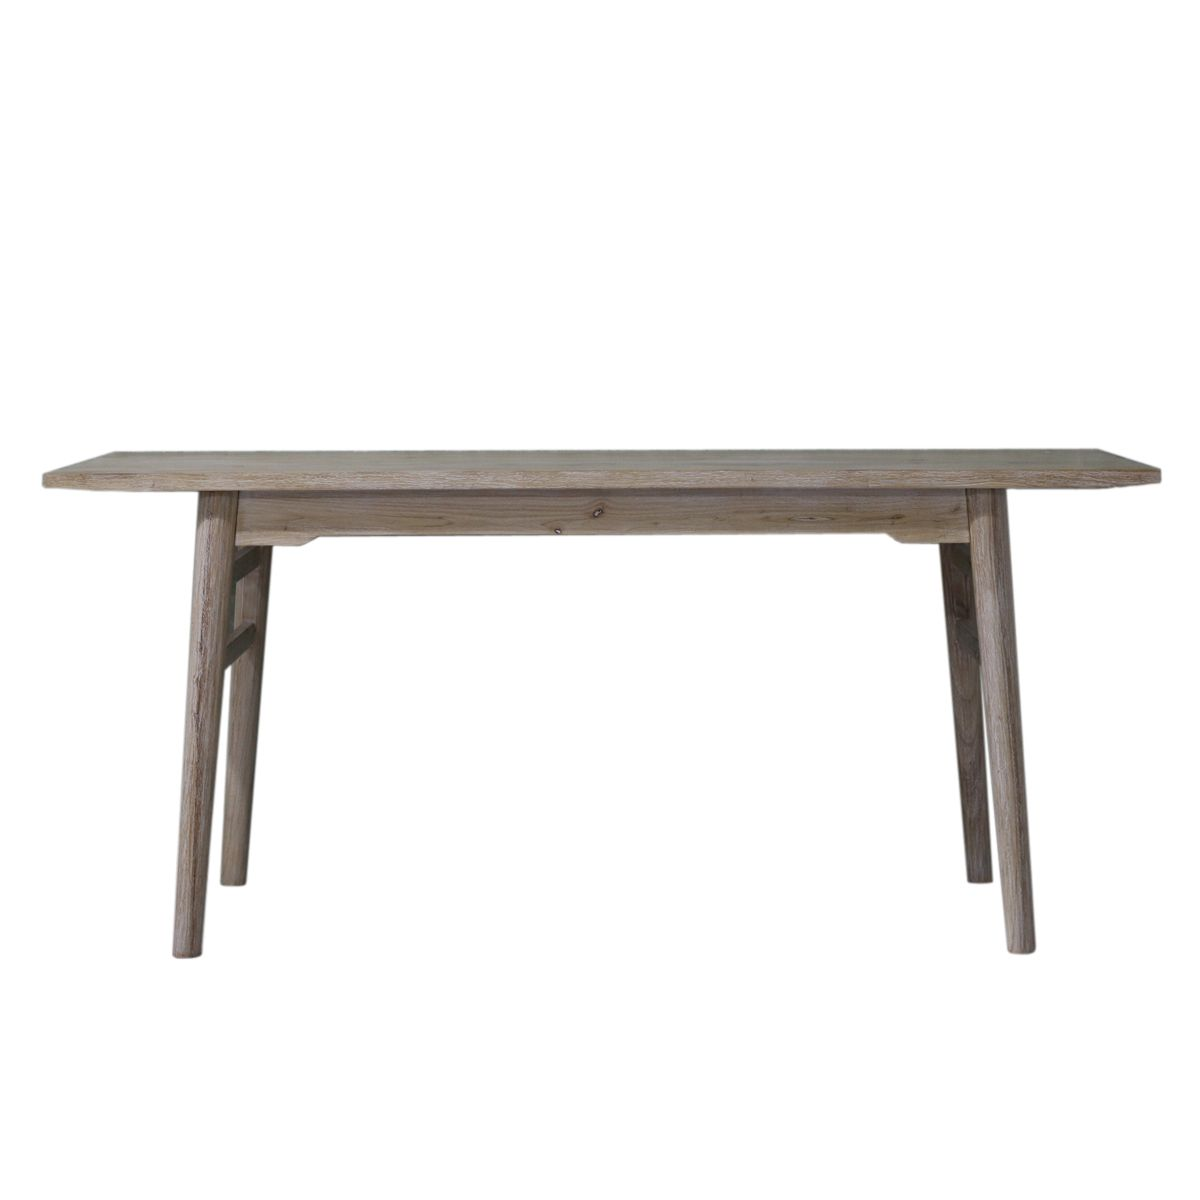 Legend of ASIA - Emily Table - NW, $690.00 (http://www.legendofasia.com/7128-NW/)